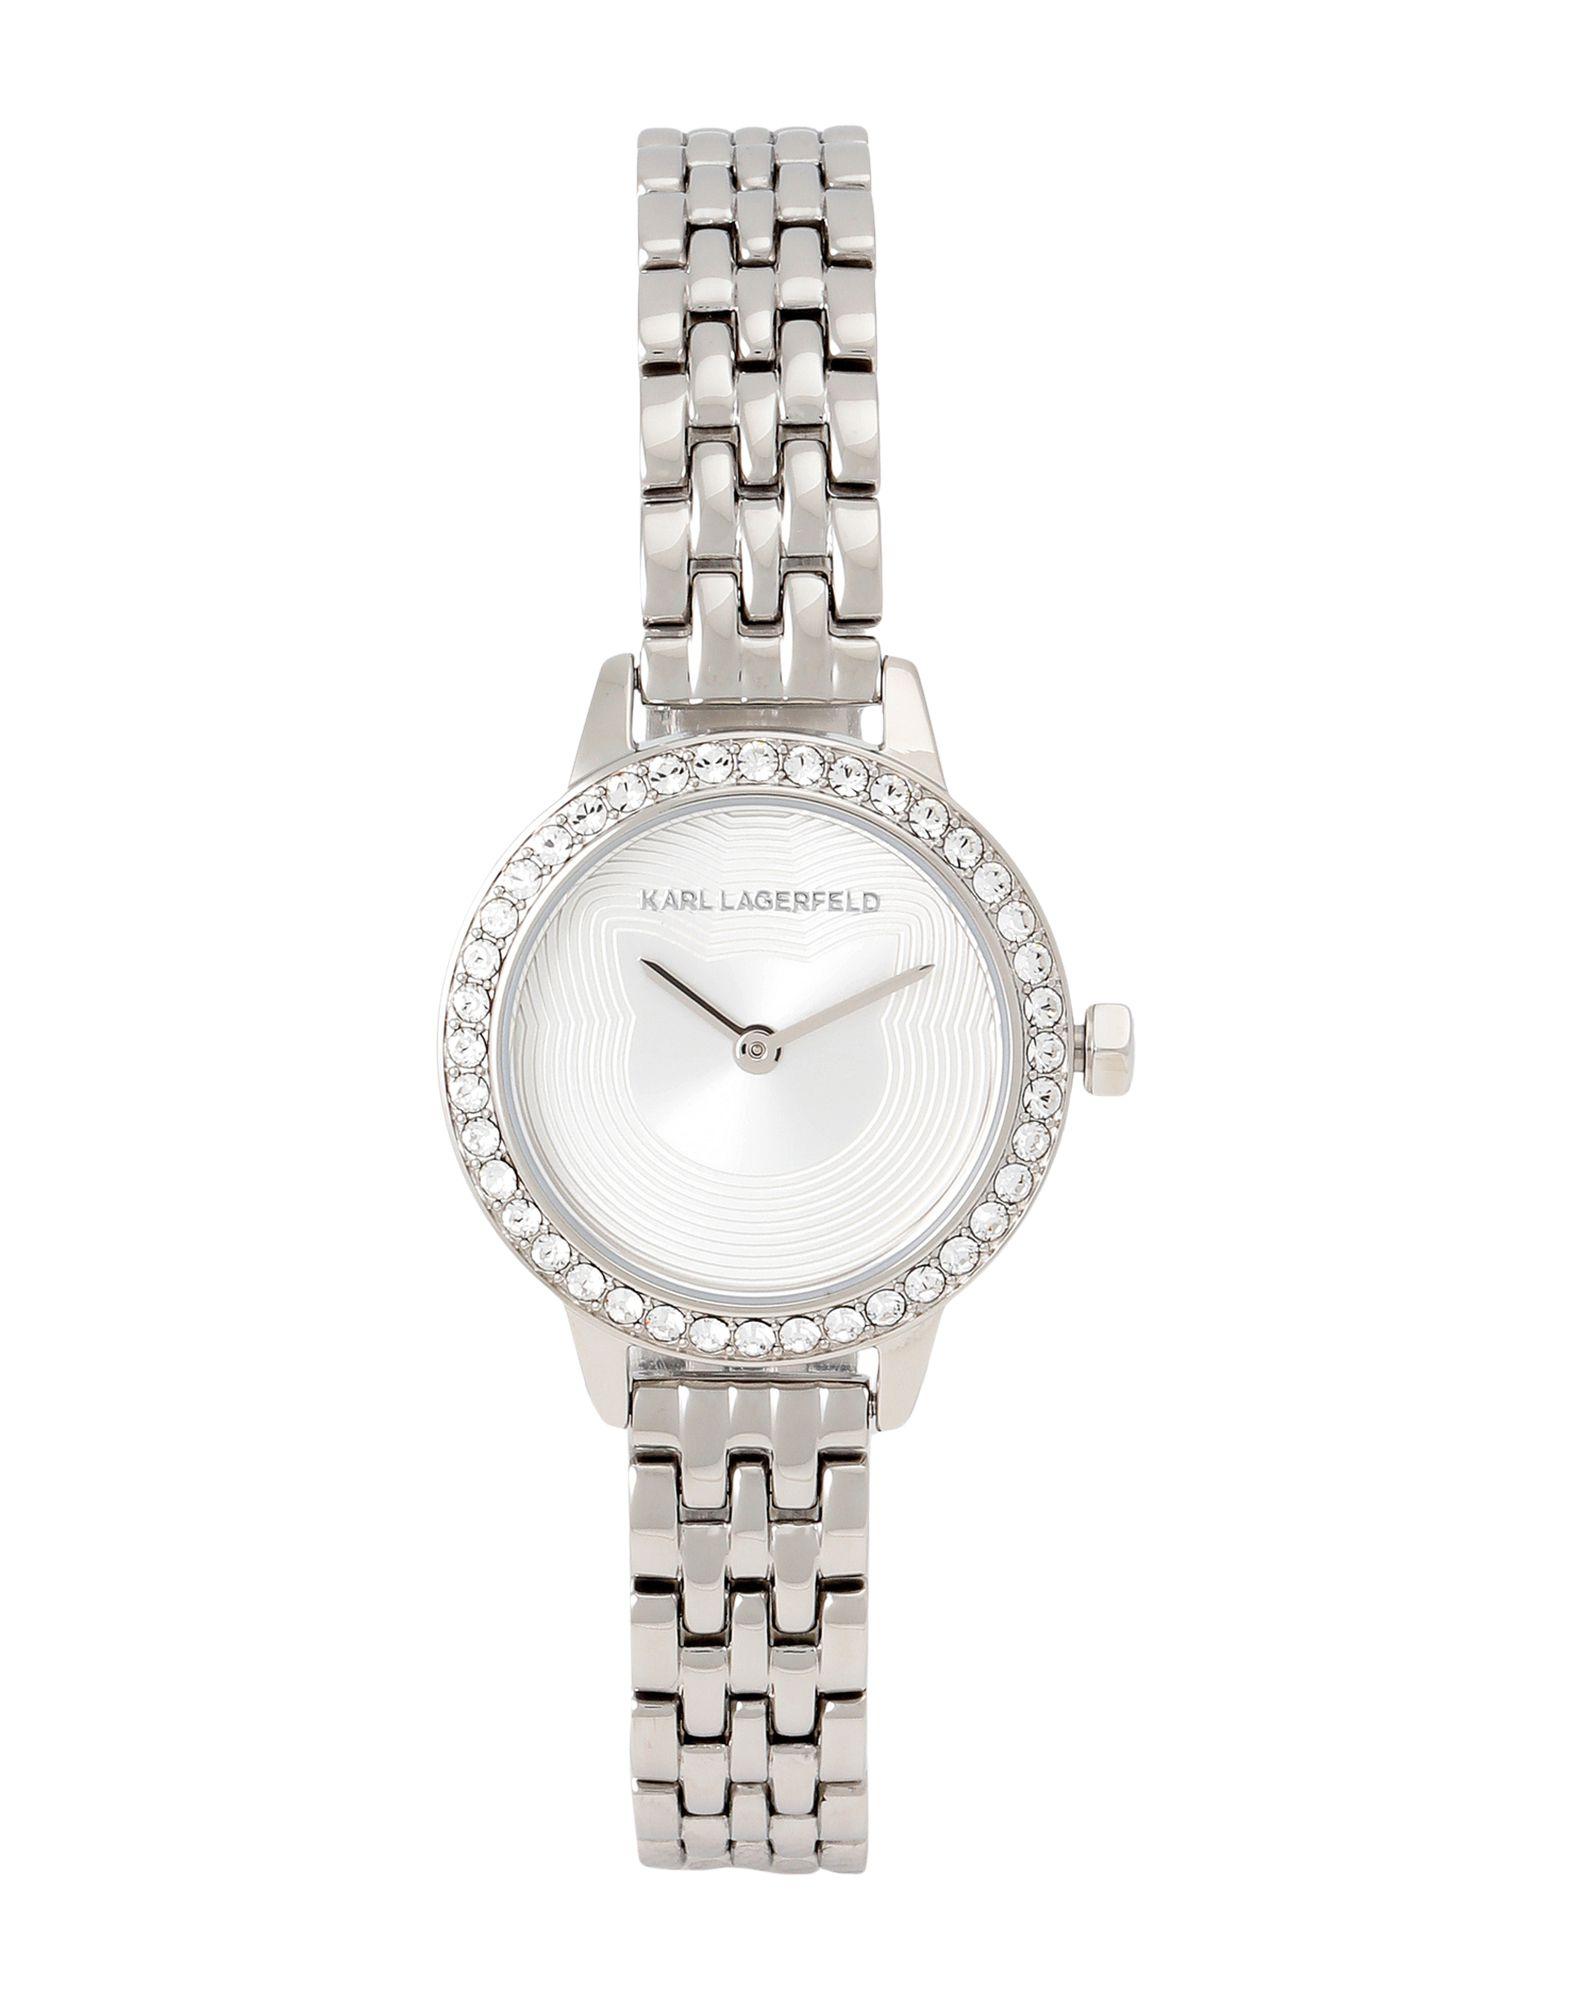 KARL LAGERFELD Wrist watches - Item 58050422